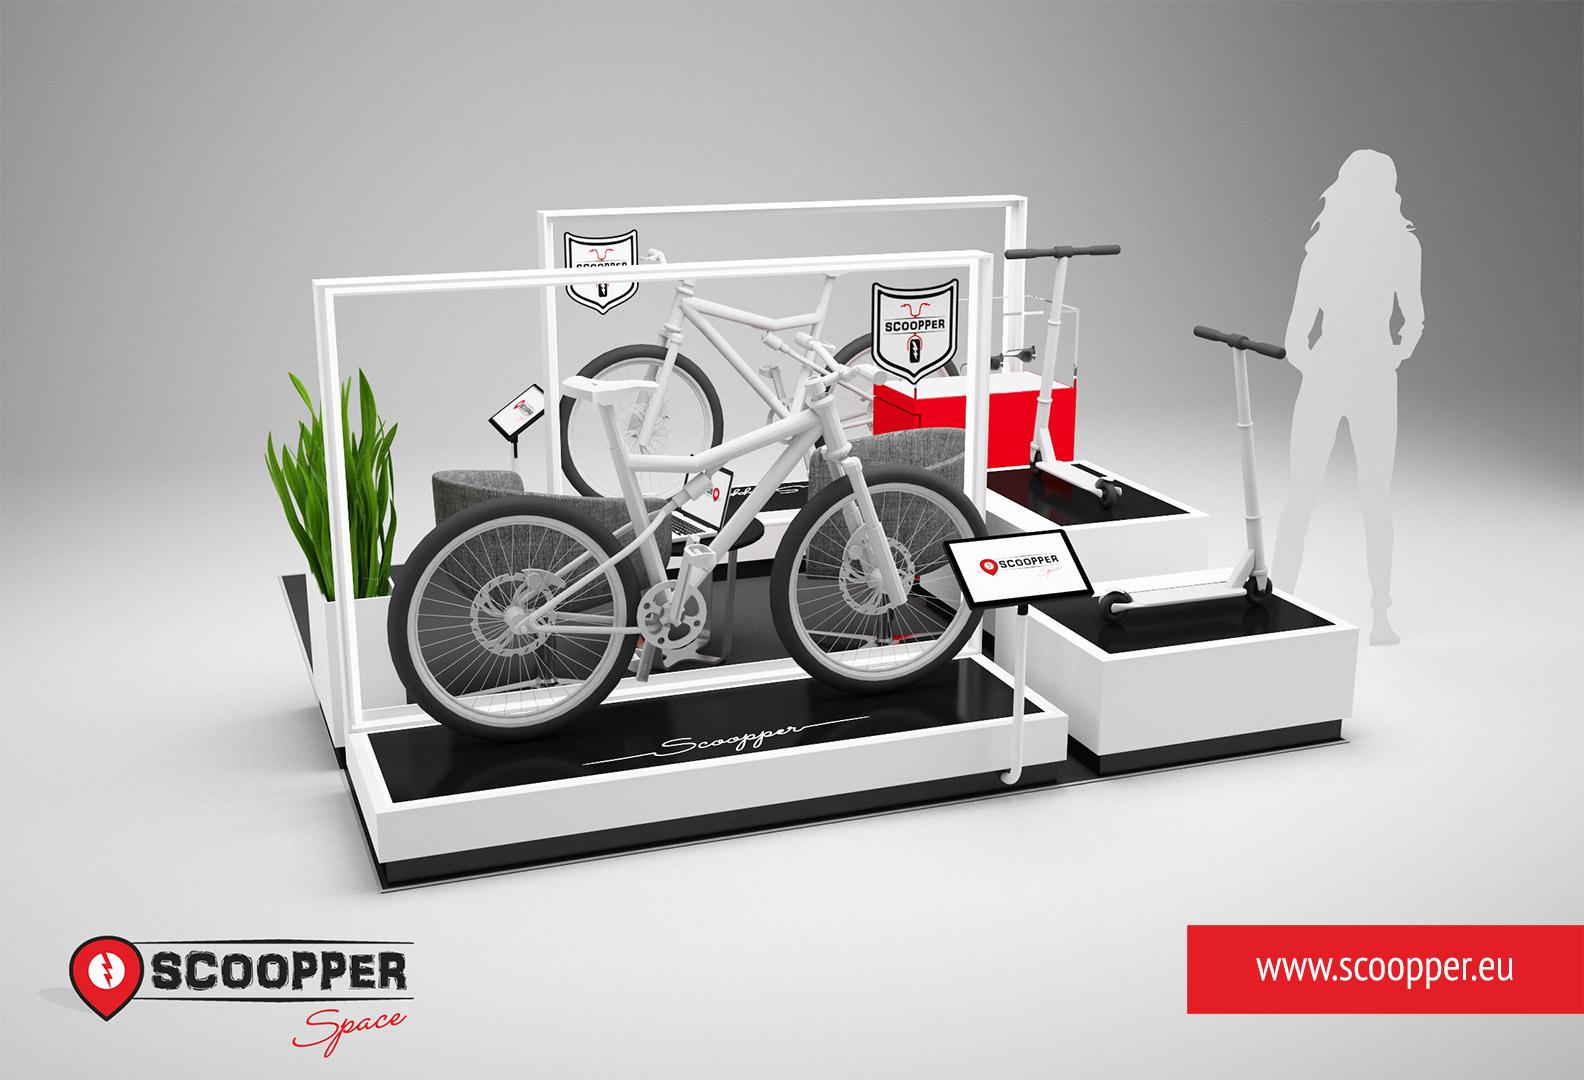 Scoopper SPACE